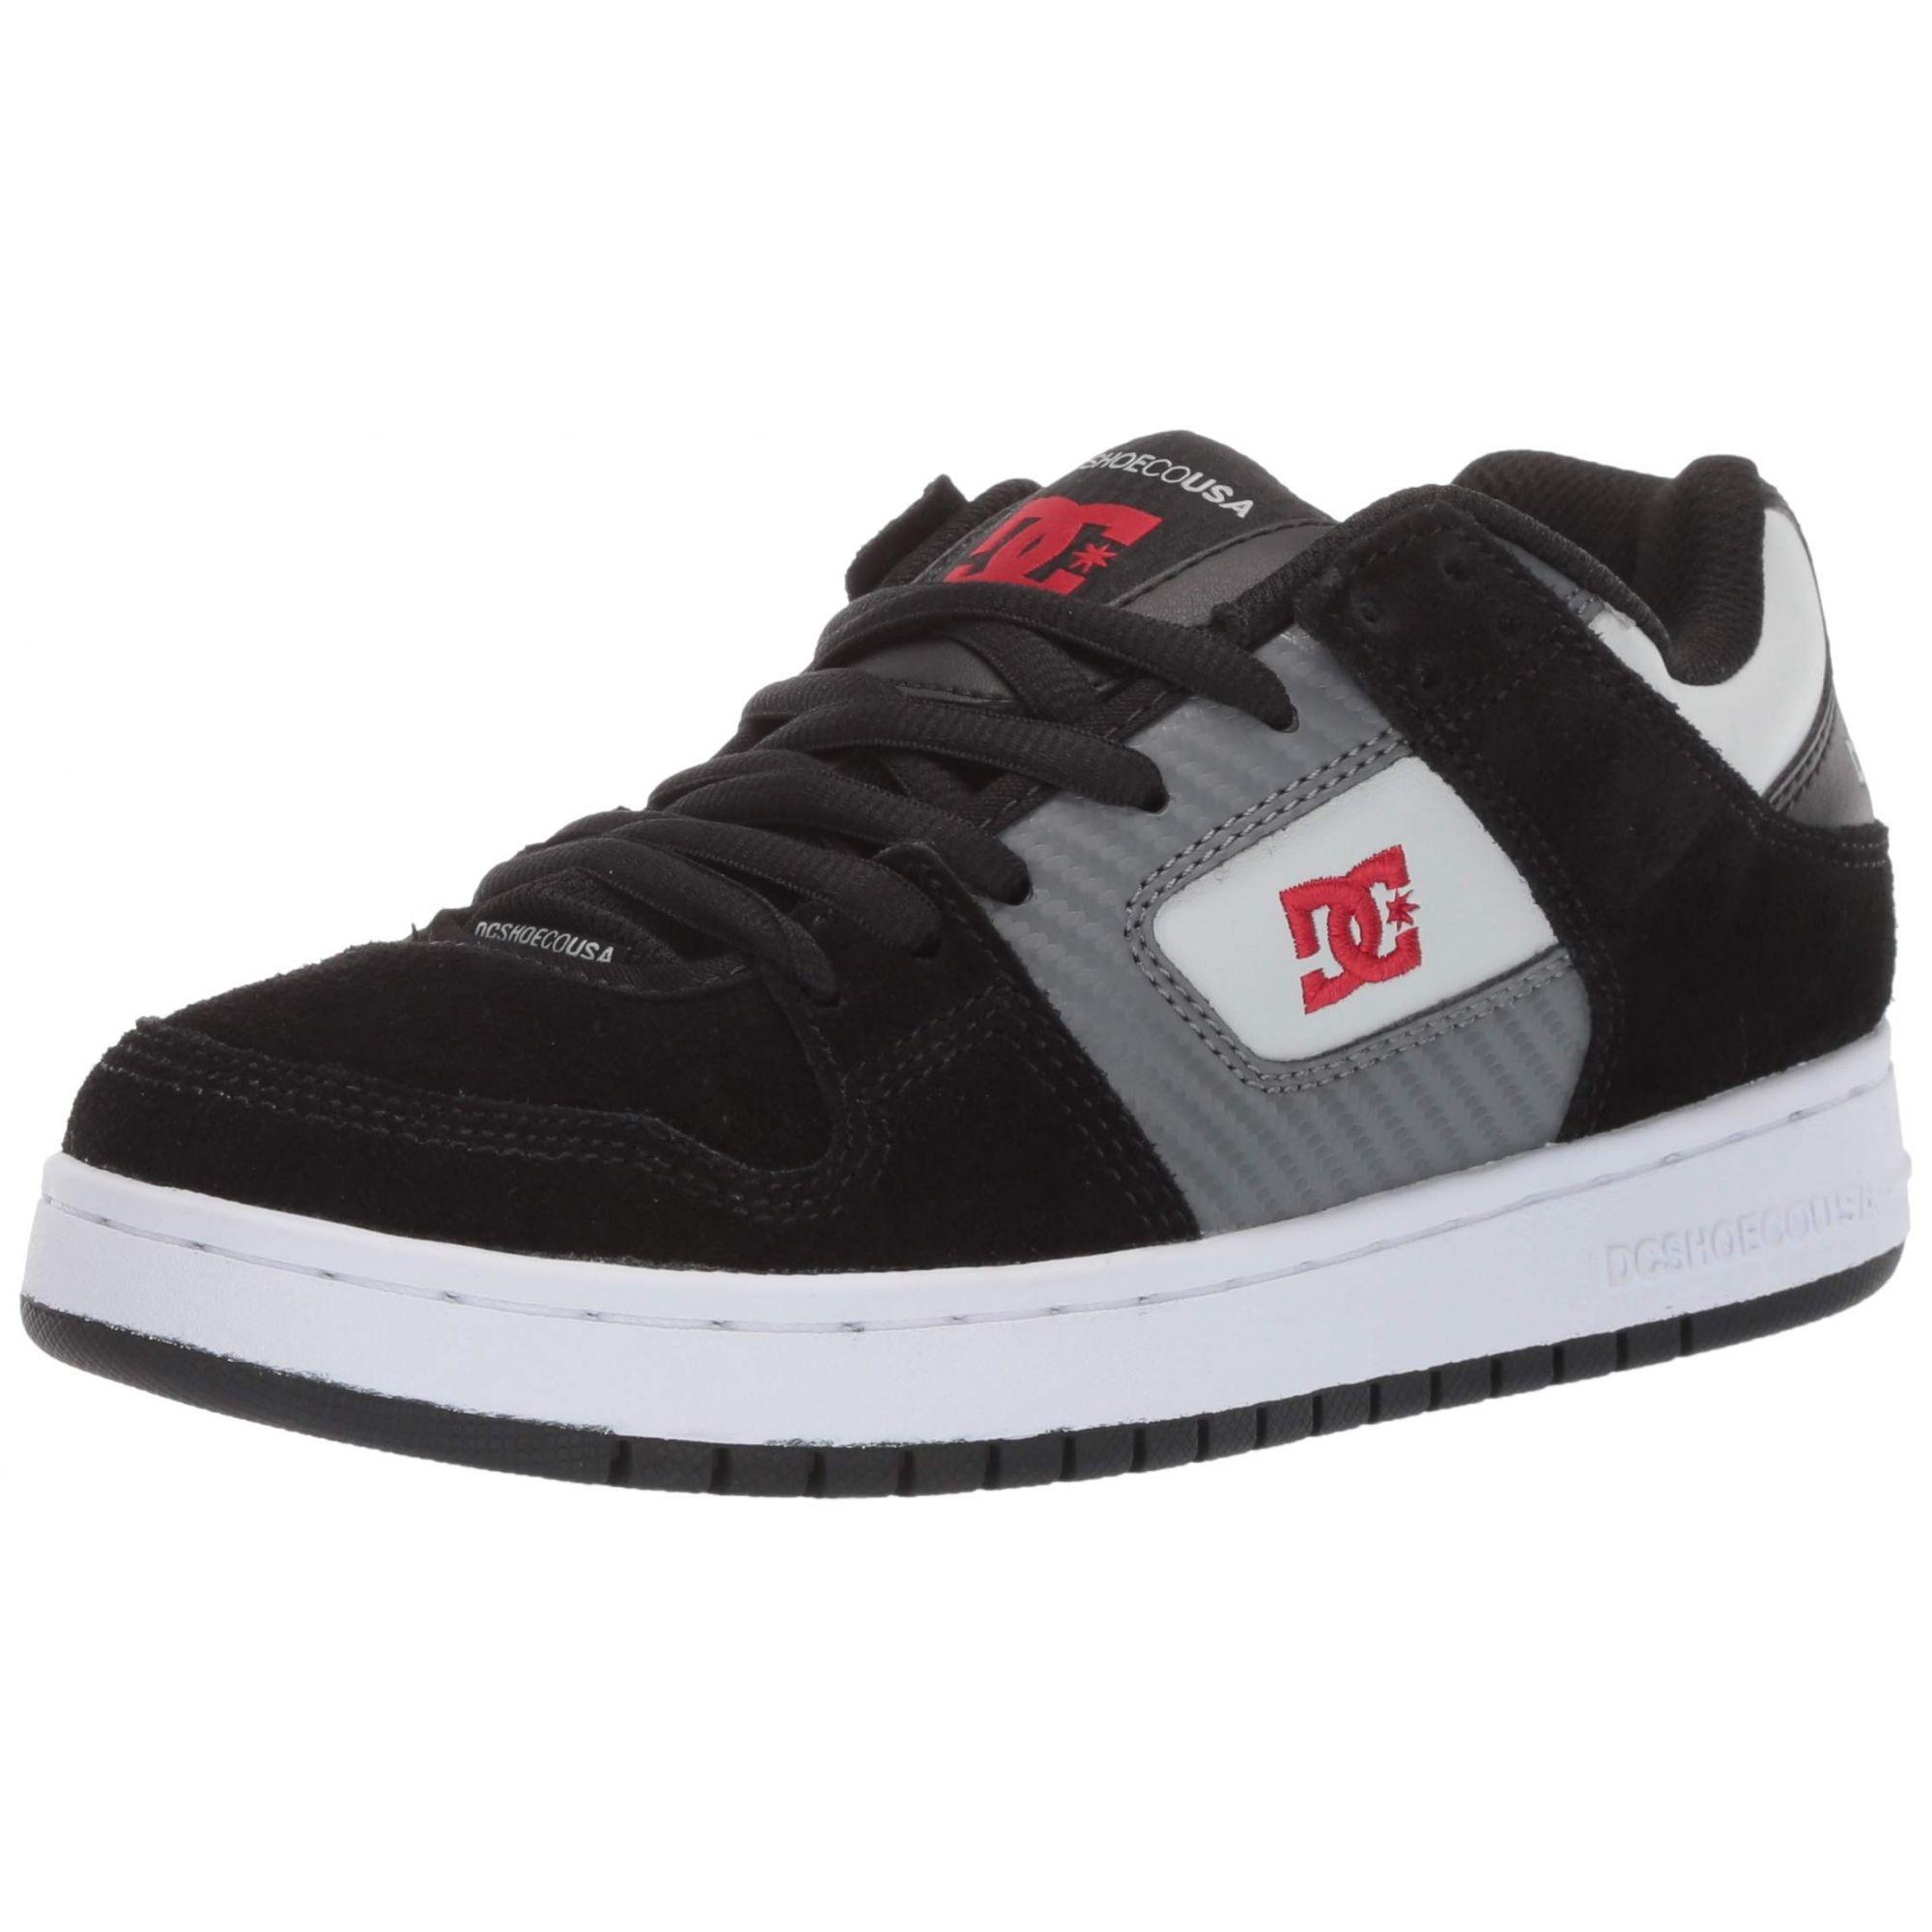 Tênis DC Shoes Manteca Imp Black/black/dk Grey